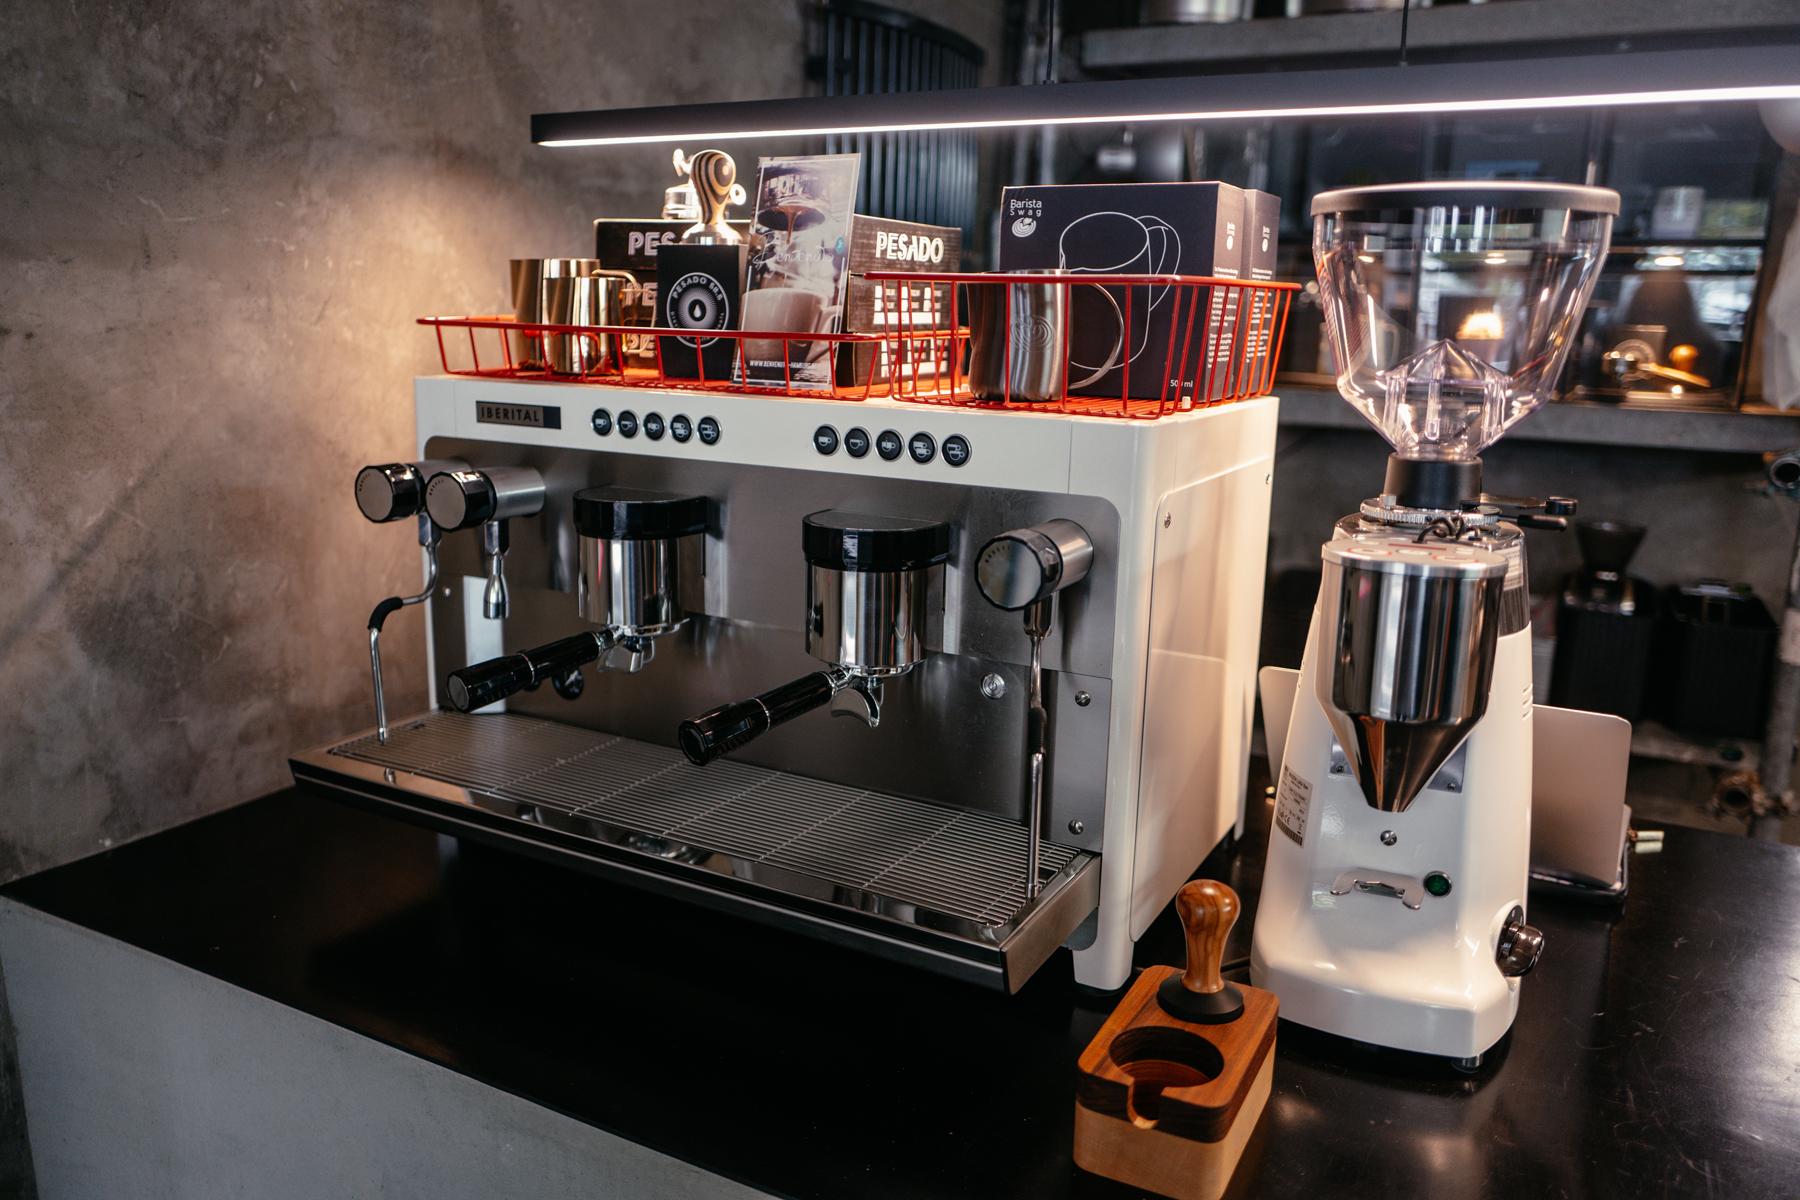 Geheimtipp Hamburg Grindelviertel Café Benvenuto Espresso Dahlina Sophie Kock 50